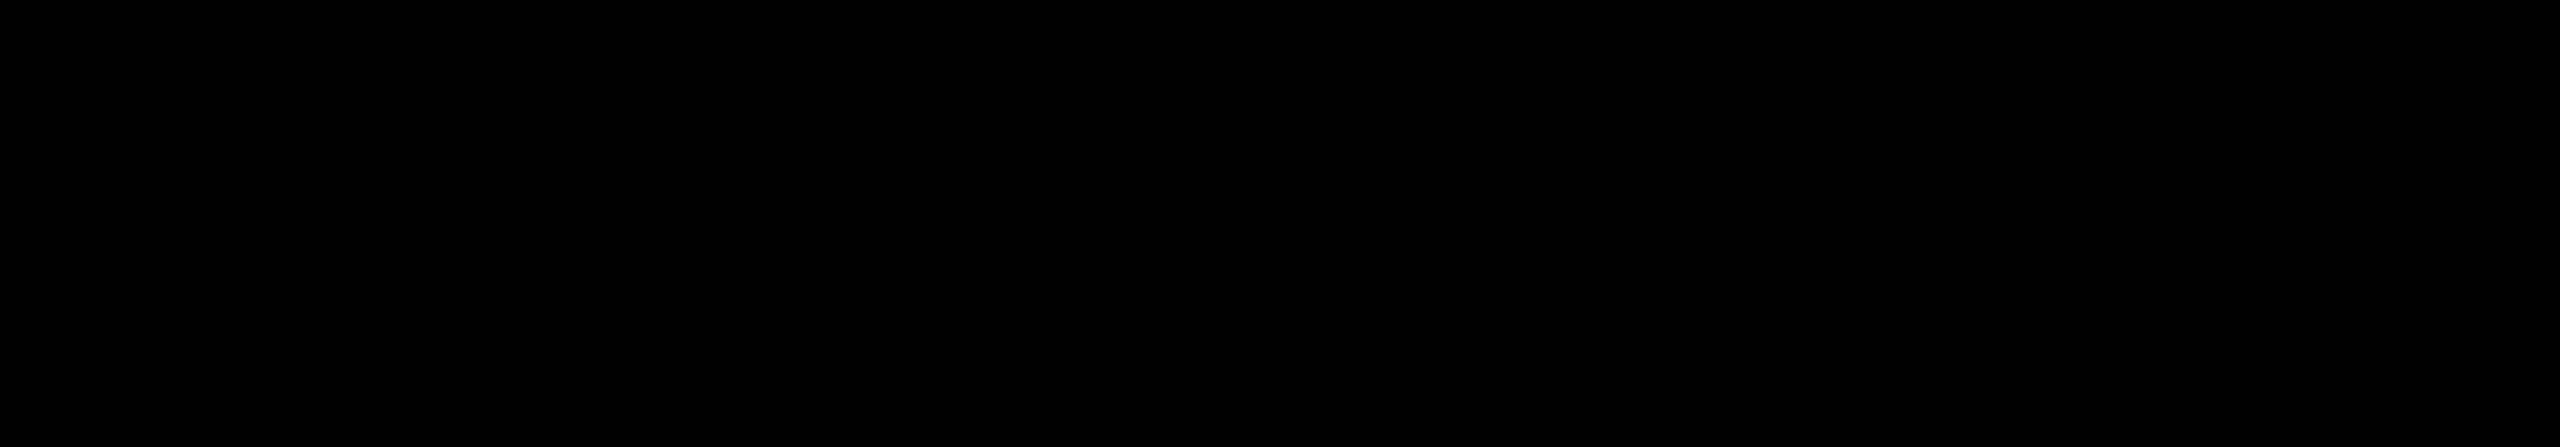 semplice_agencylogos_centered_02_bbdo_png24